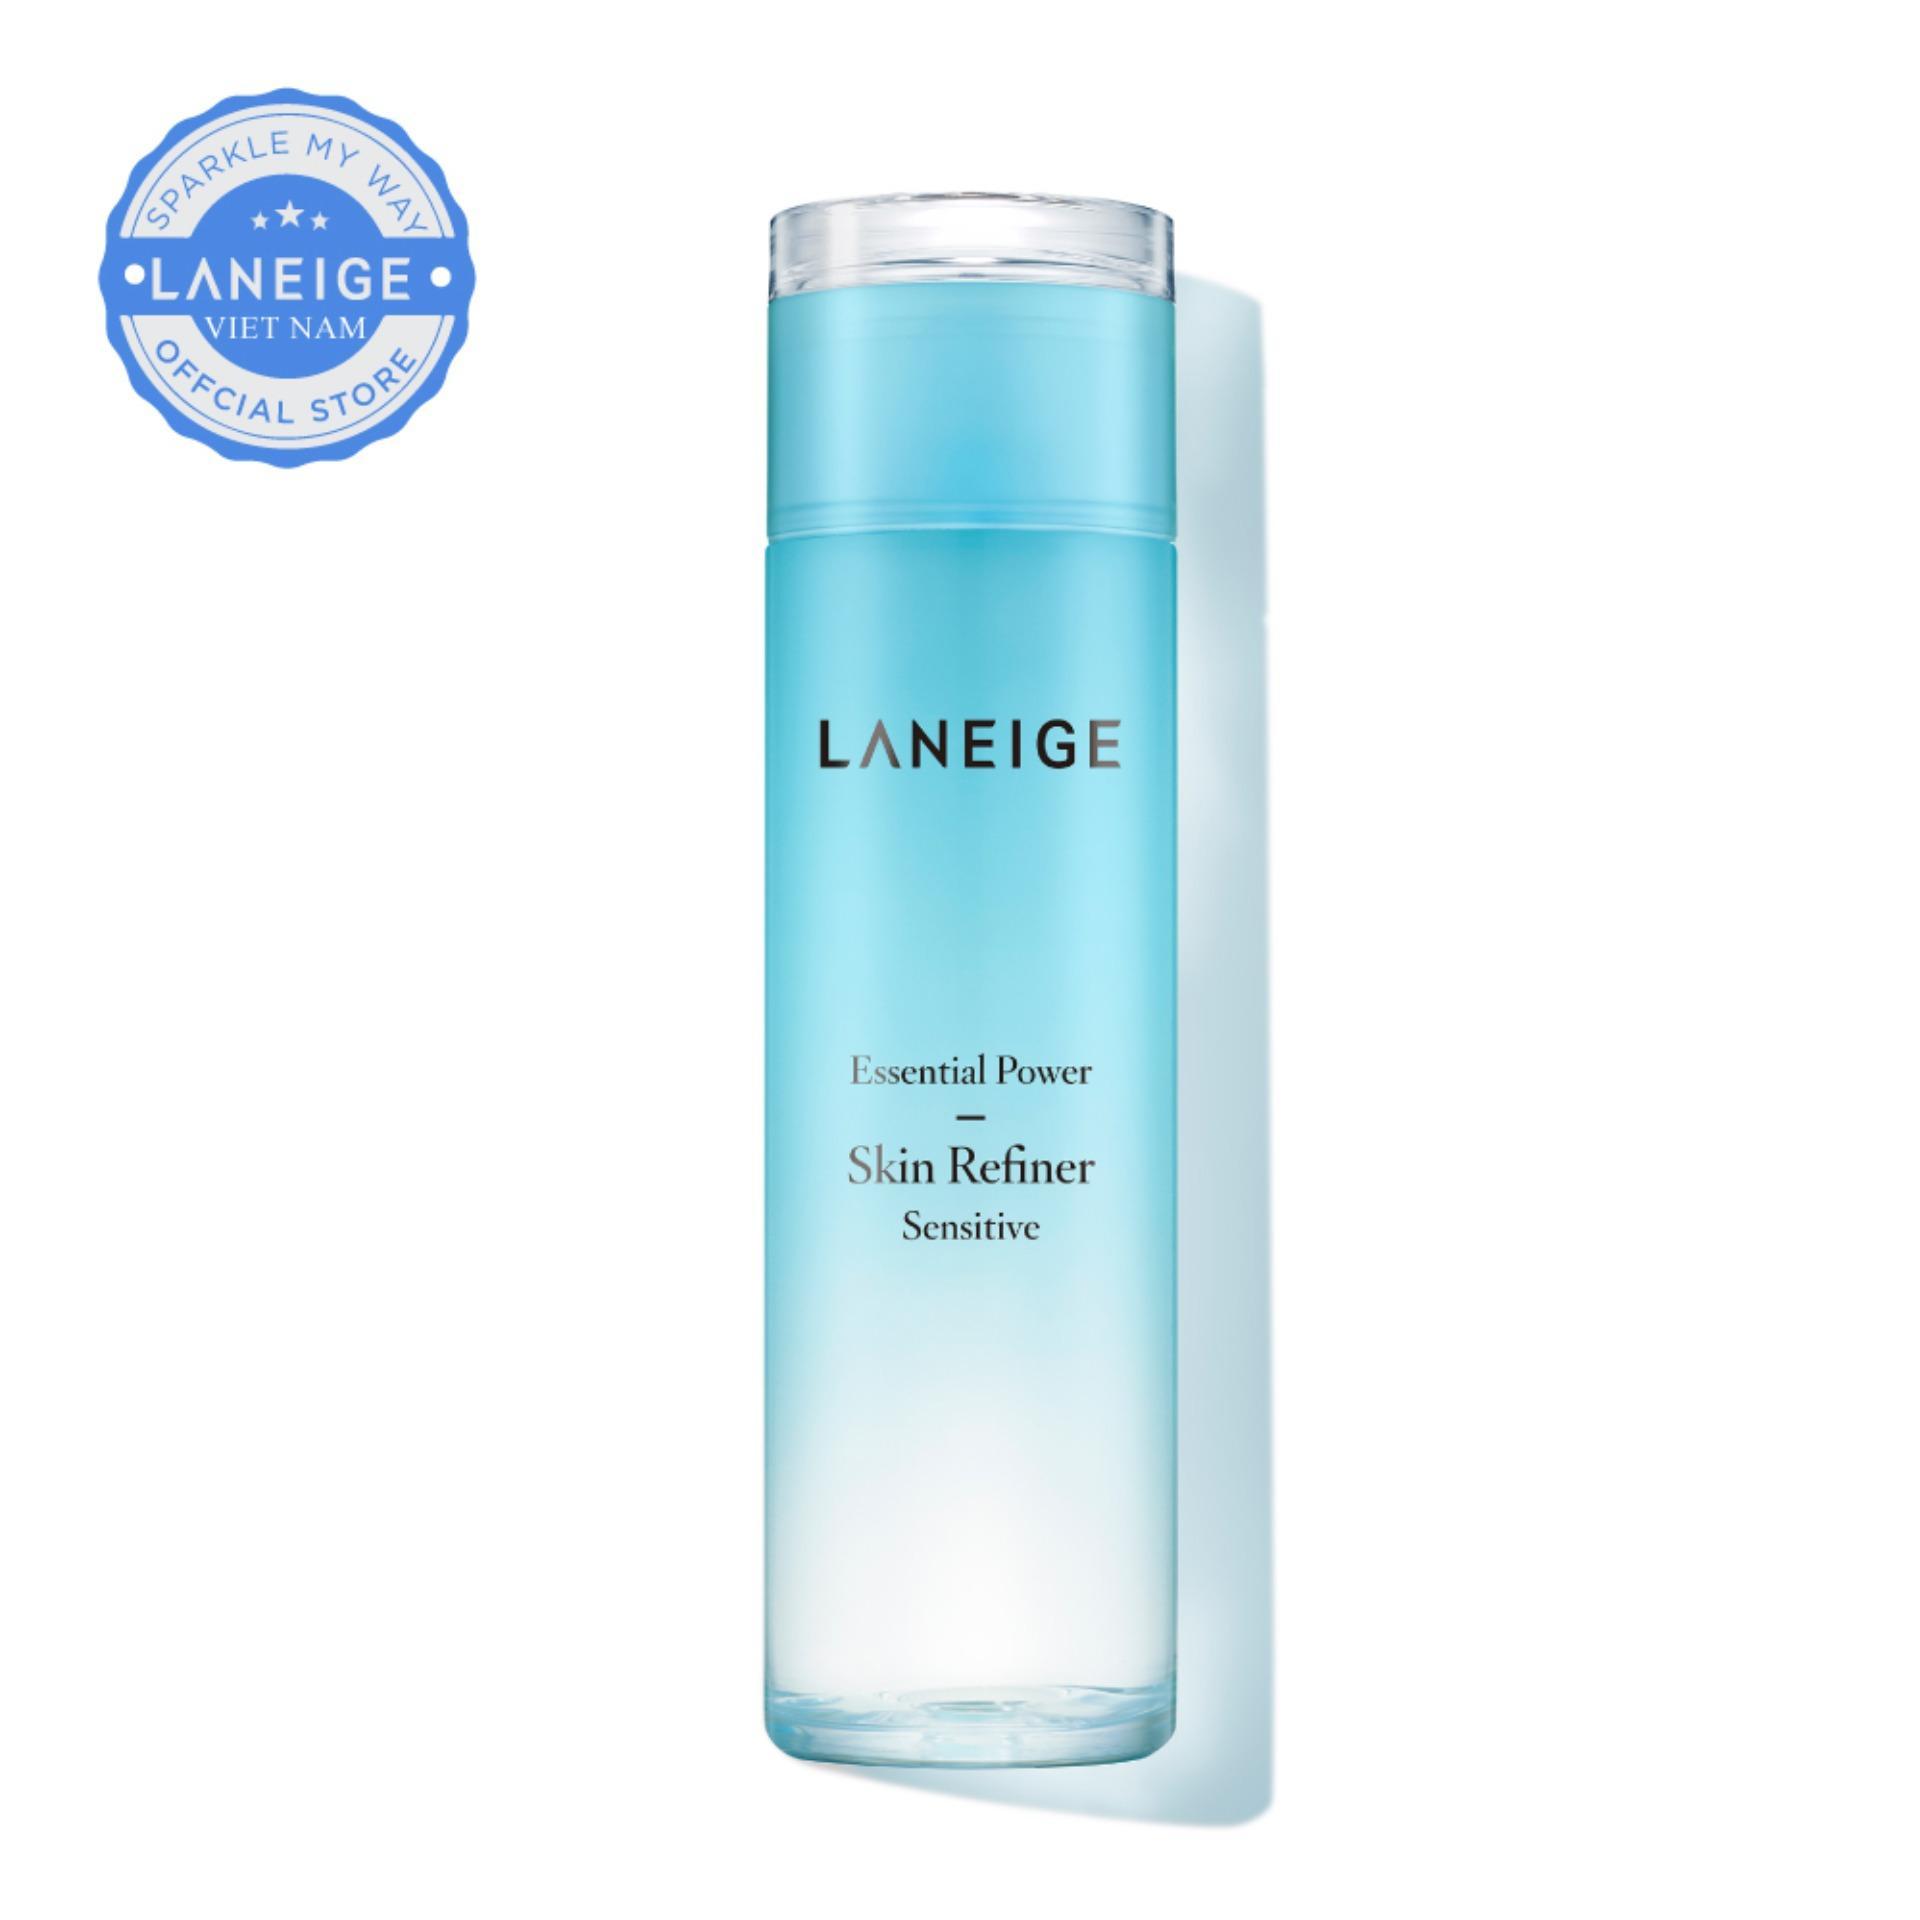 Nước cân bằng Laneige Essential Power Skin Refiner Sensitive cho da nhạy cảm 200ml